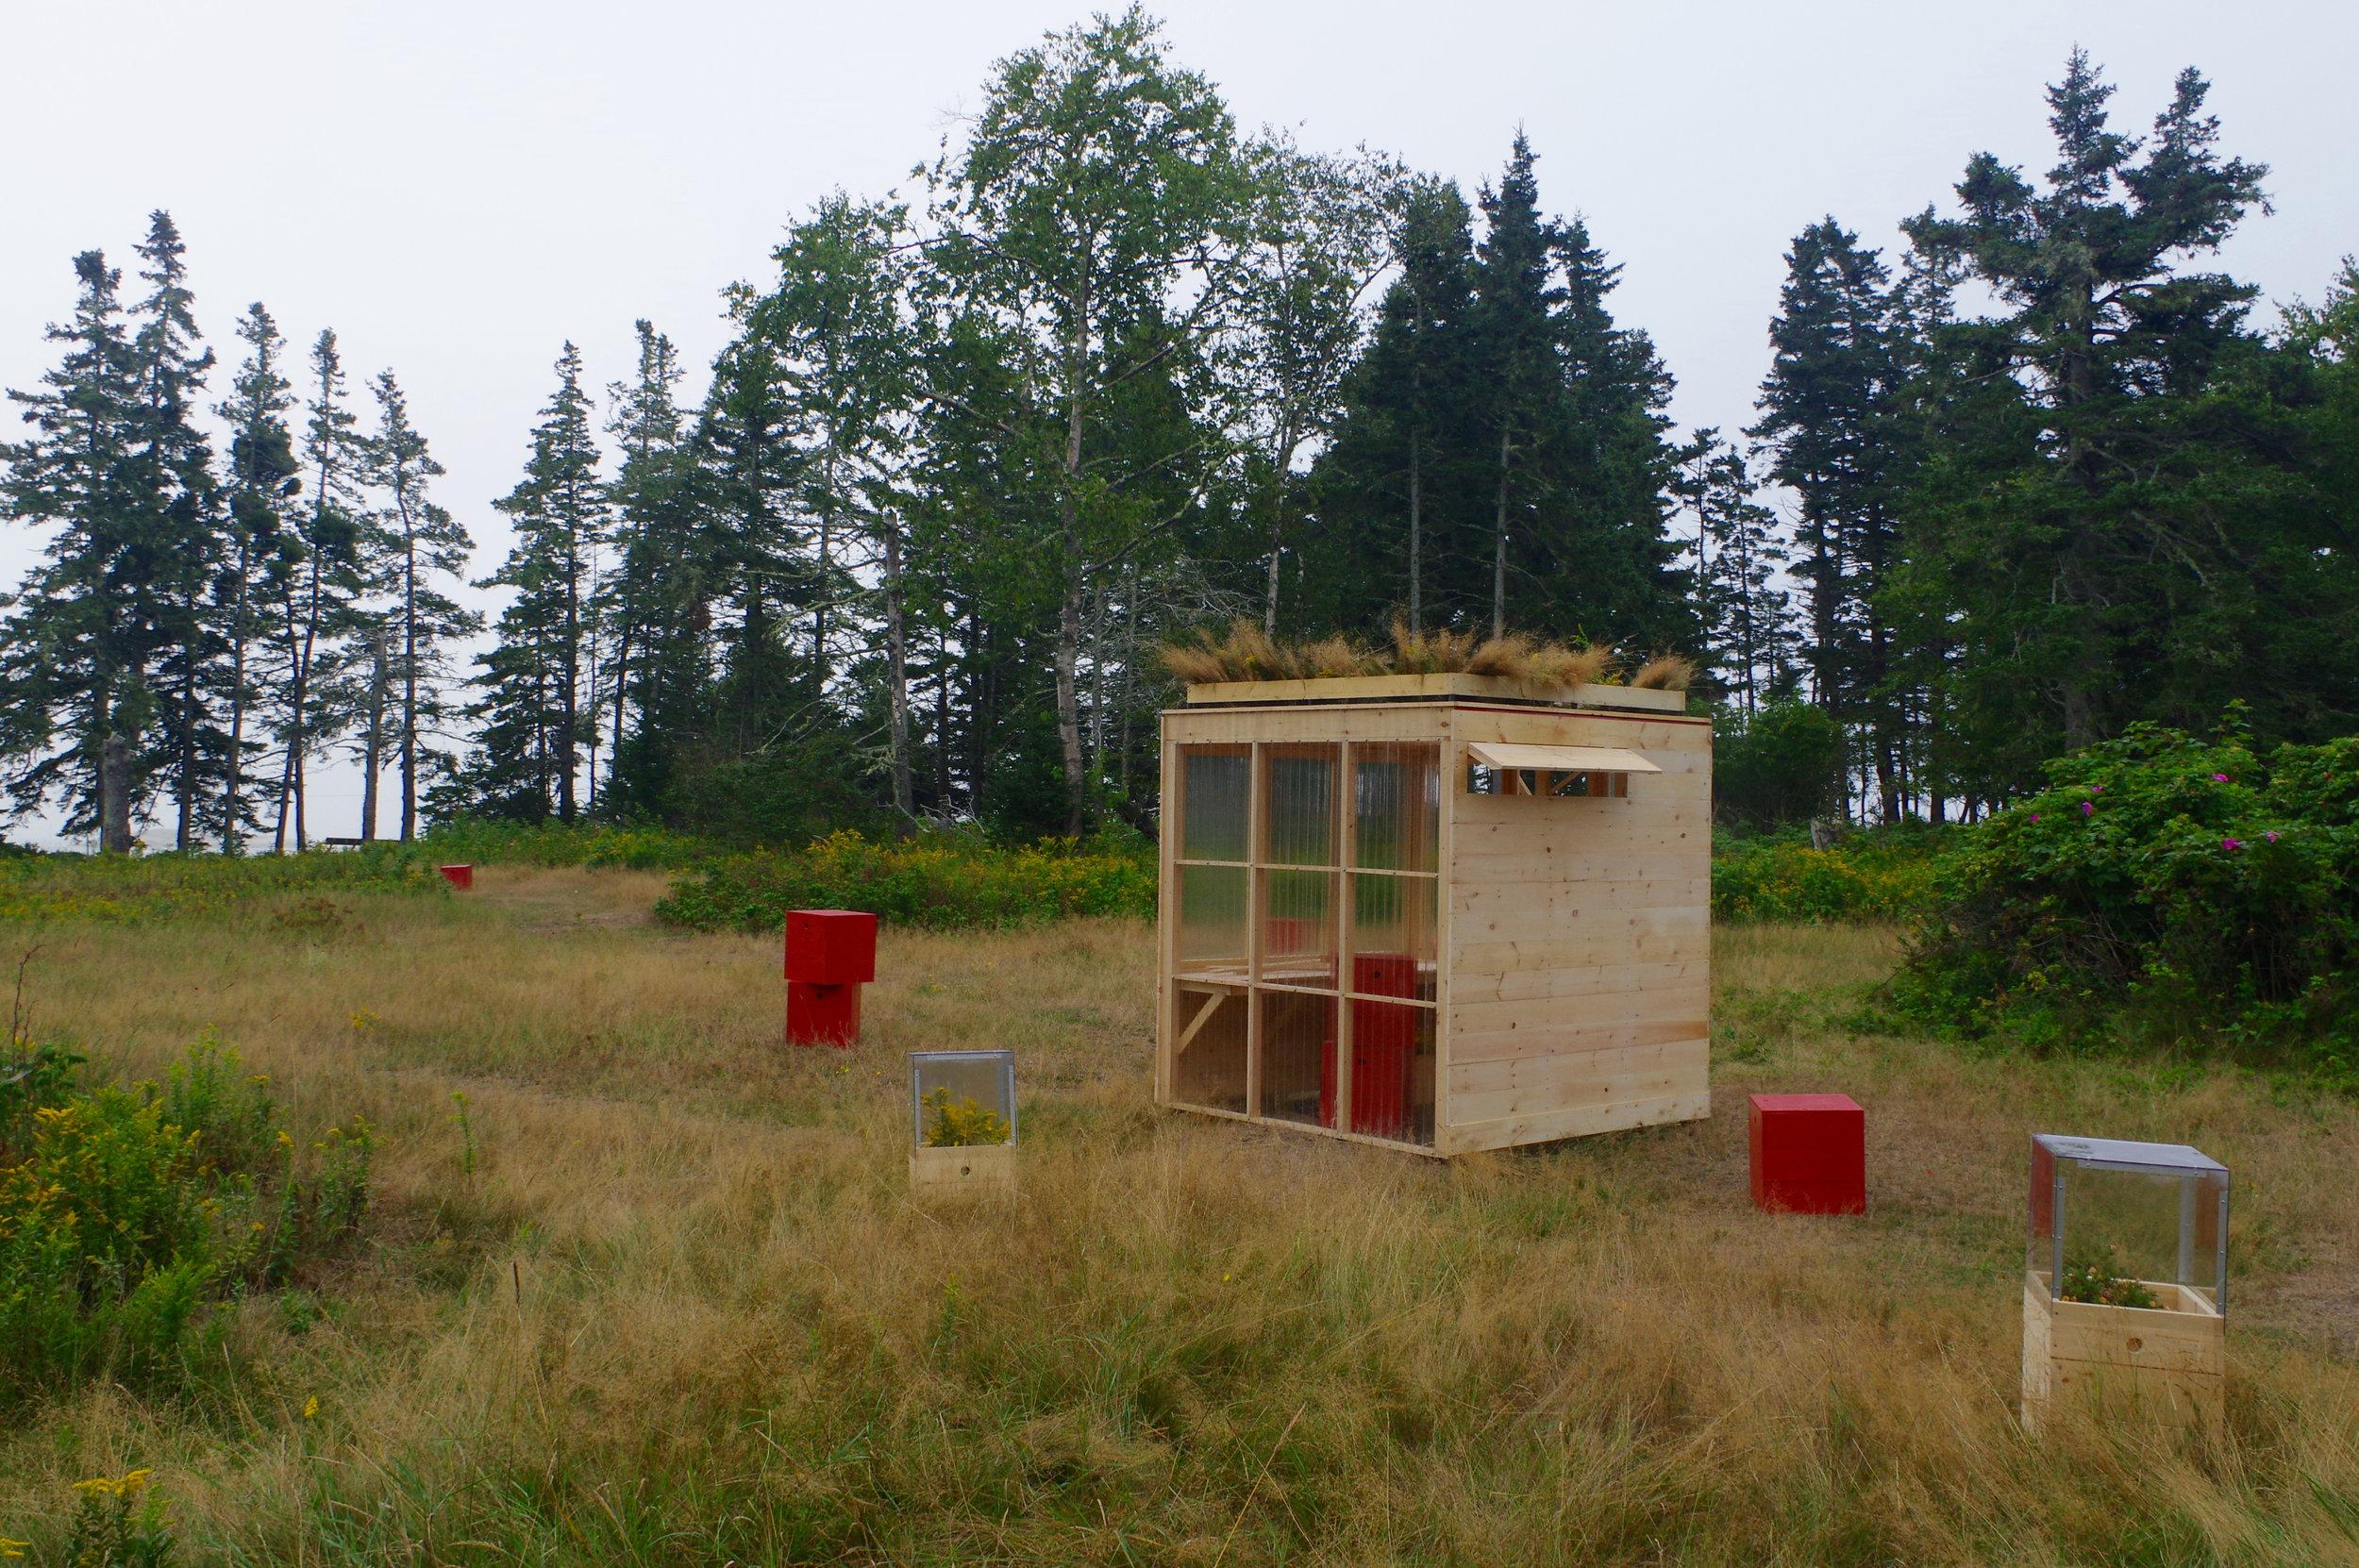 Vinalhaven Island School Greenhouse - 2016